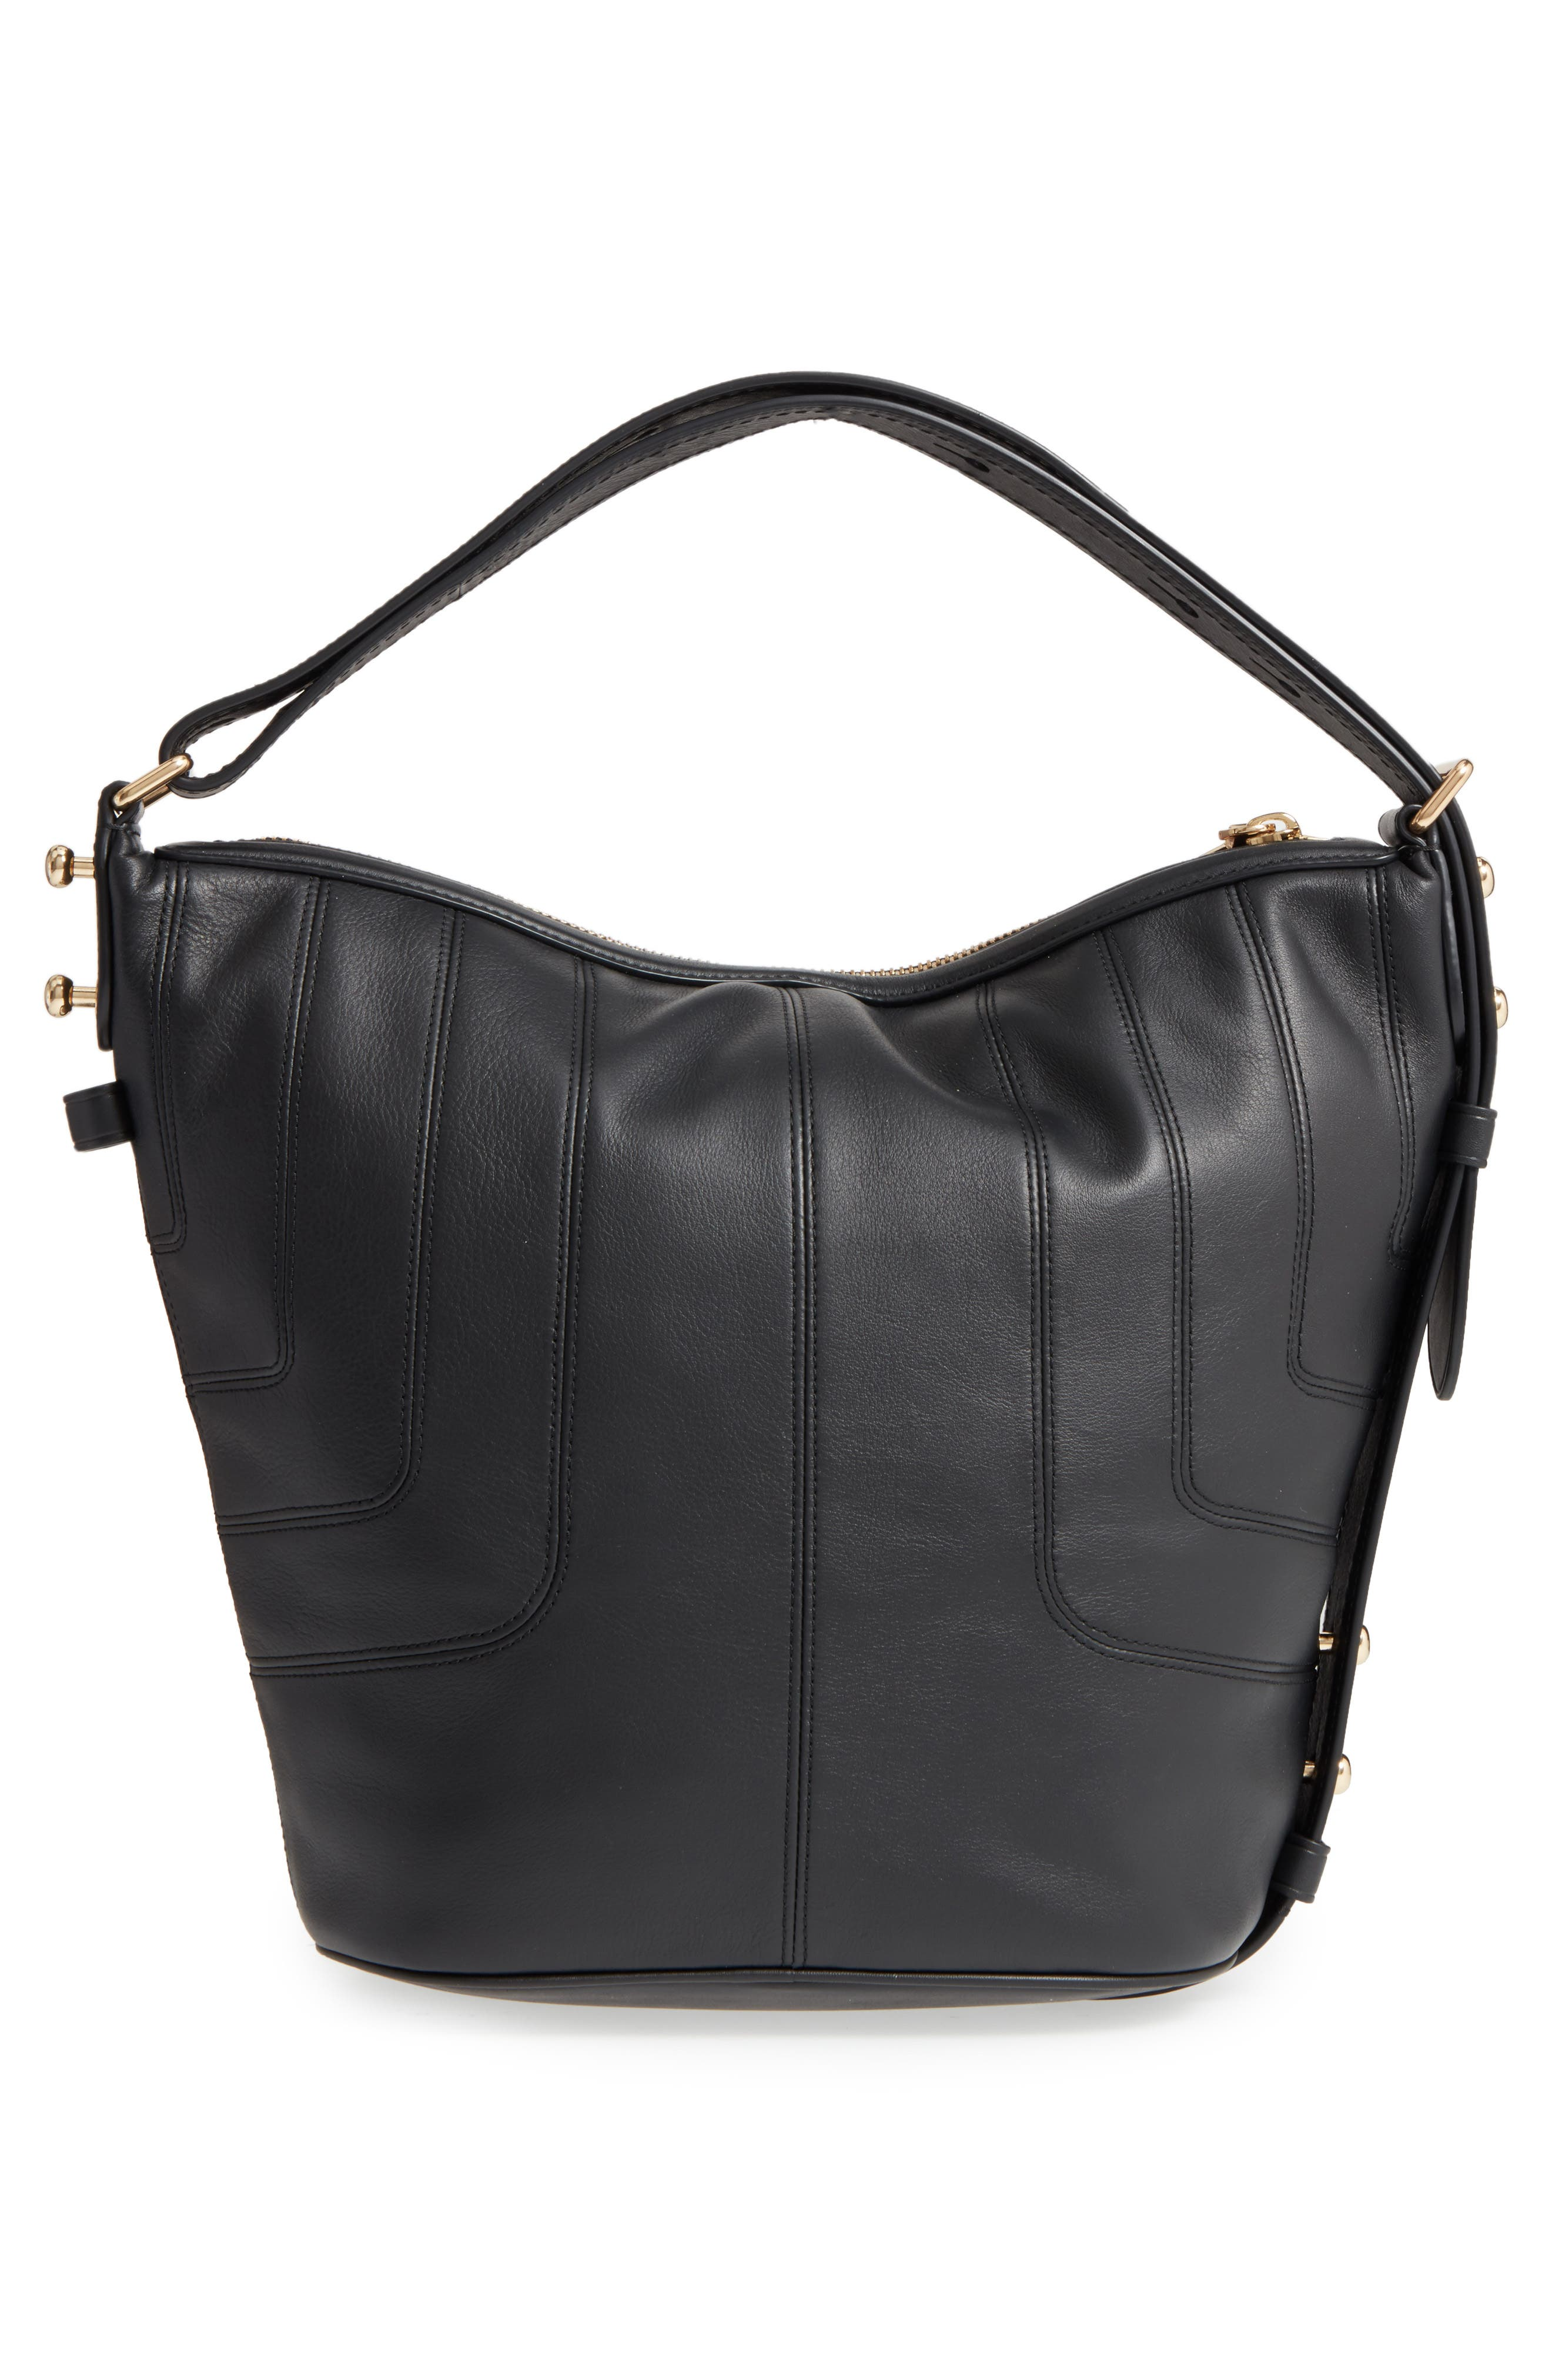 Alternate Image 2  - MARC JACOBS The Sling Mod Leather Hobo/Crossbody/Sling Bag